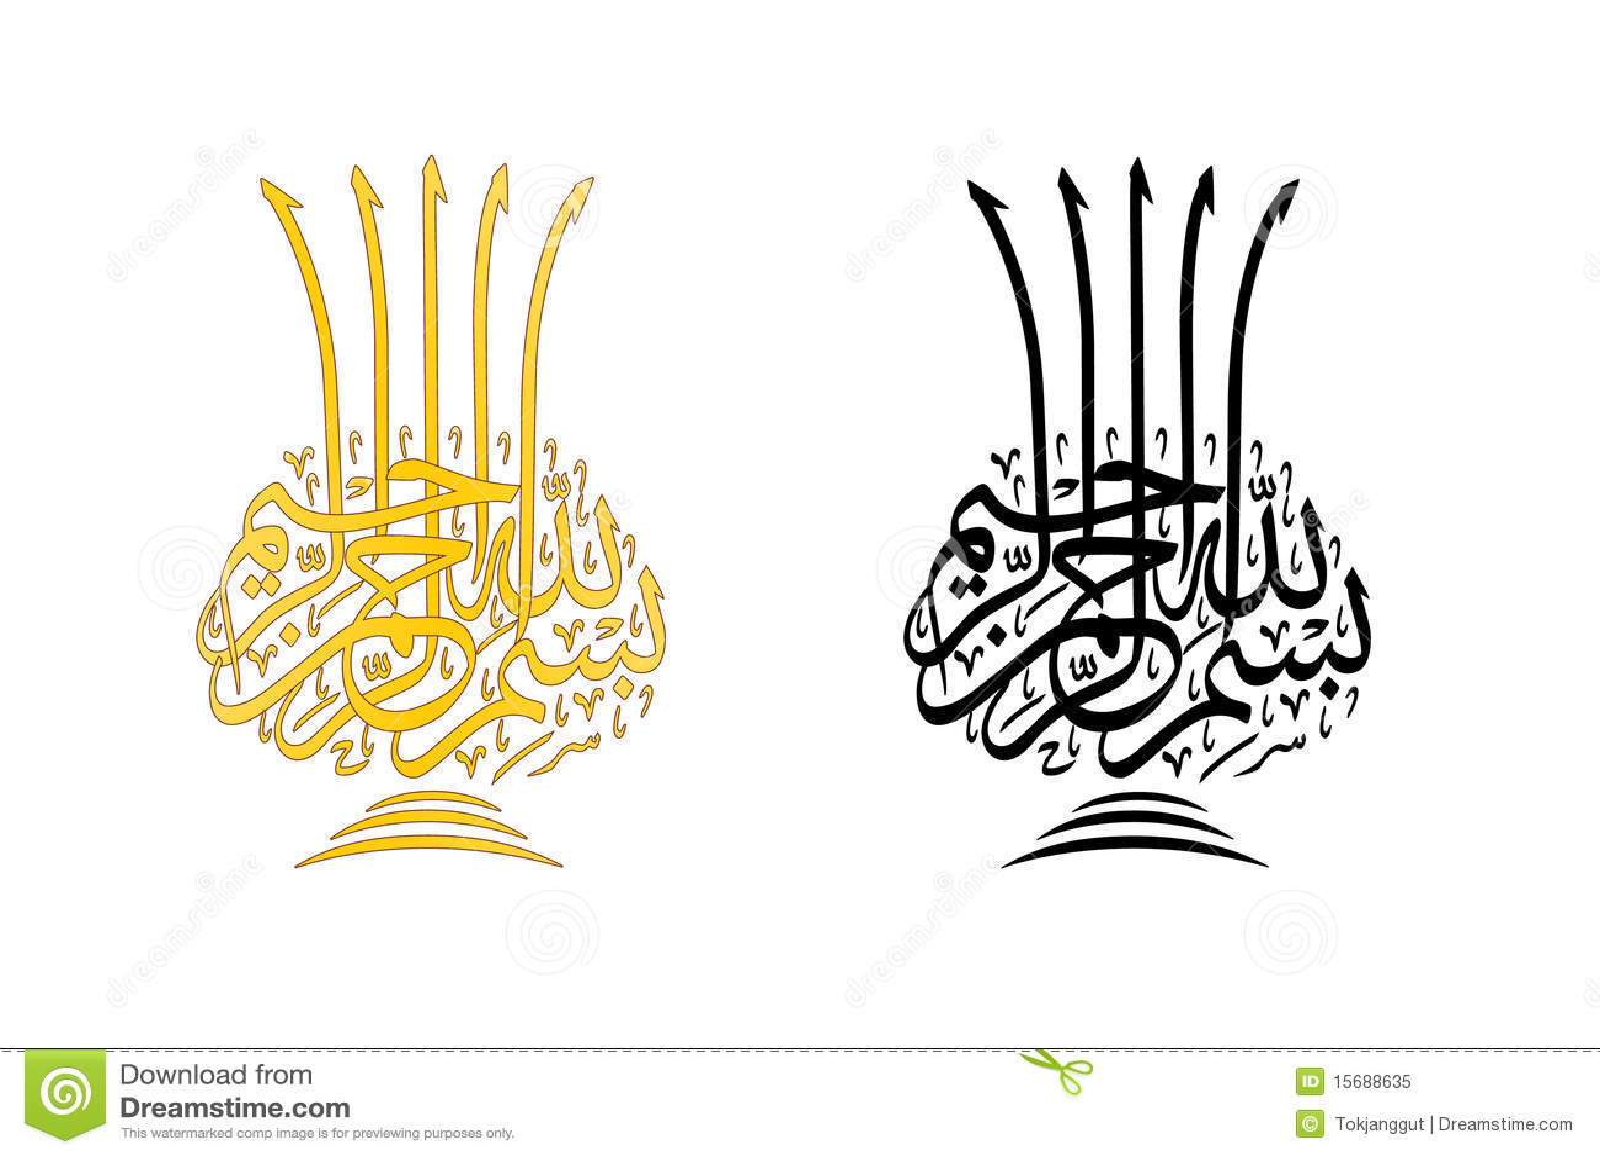 Islamic Arabic Muslim Wall Art Vinyl Decal Sticker - Four (4) Khalifs ...